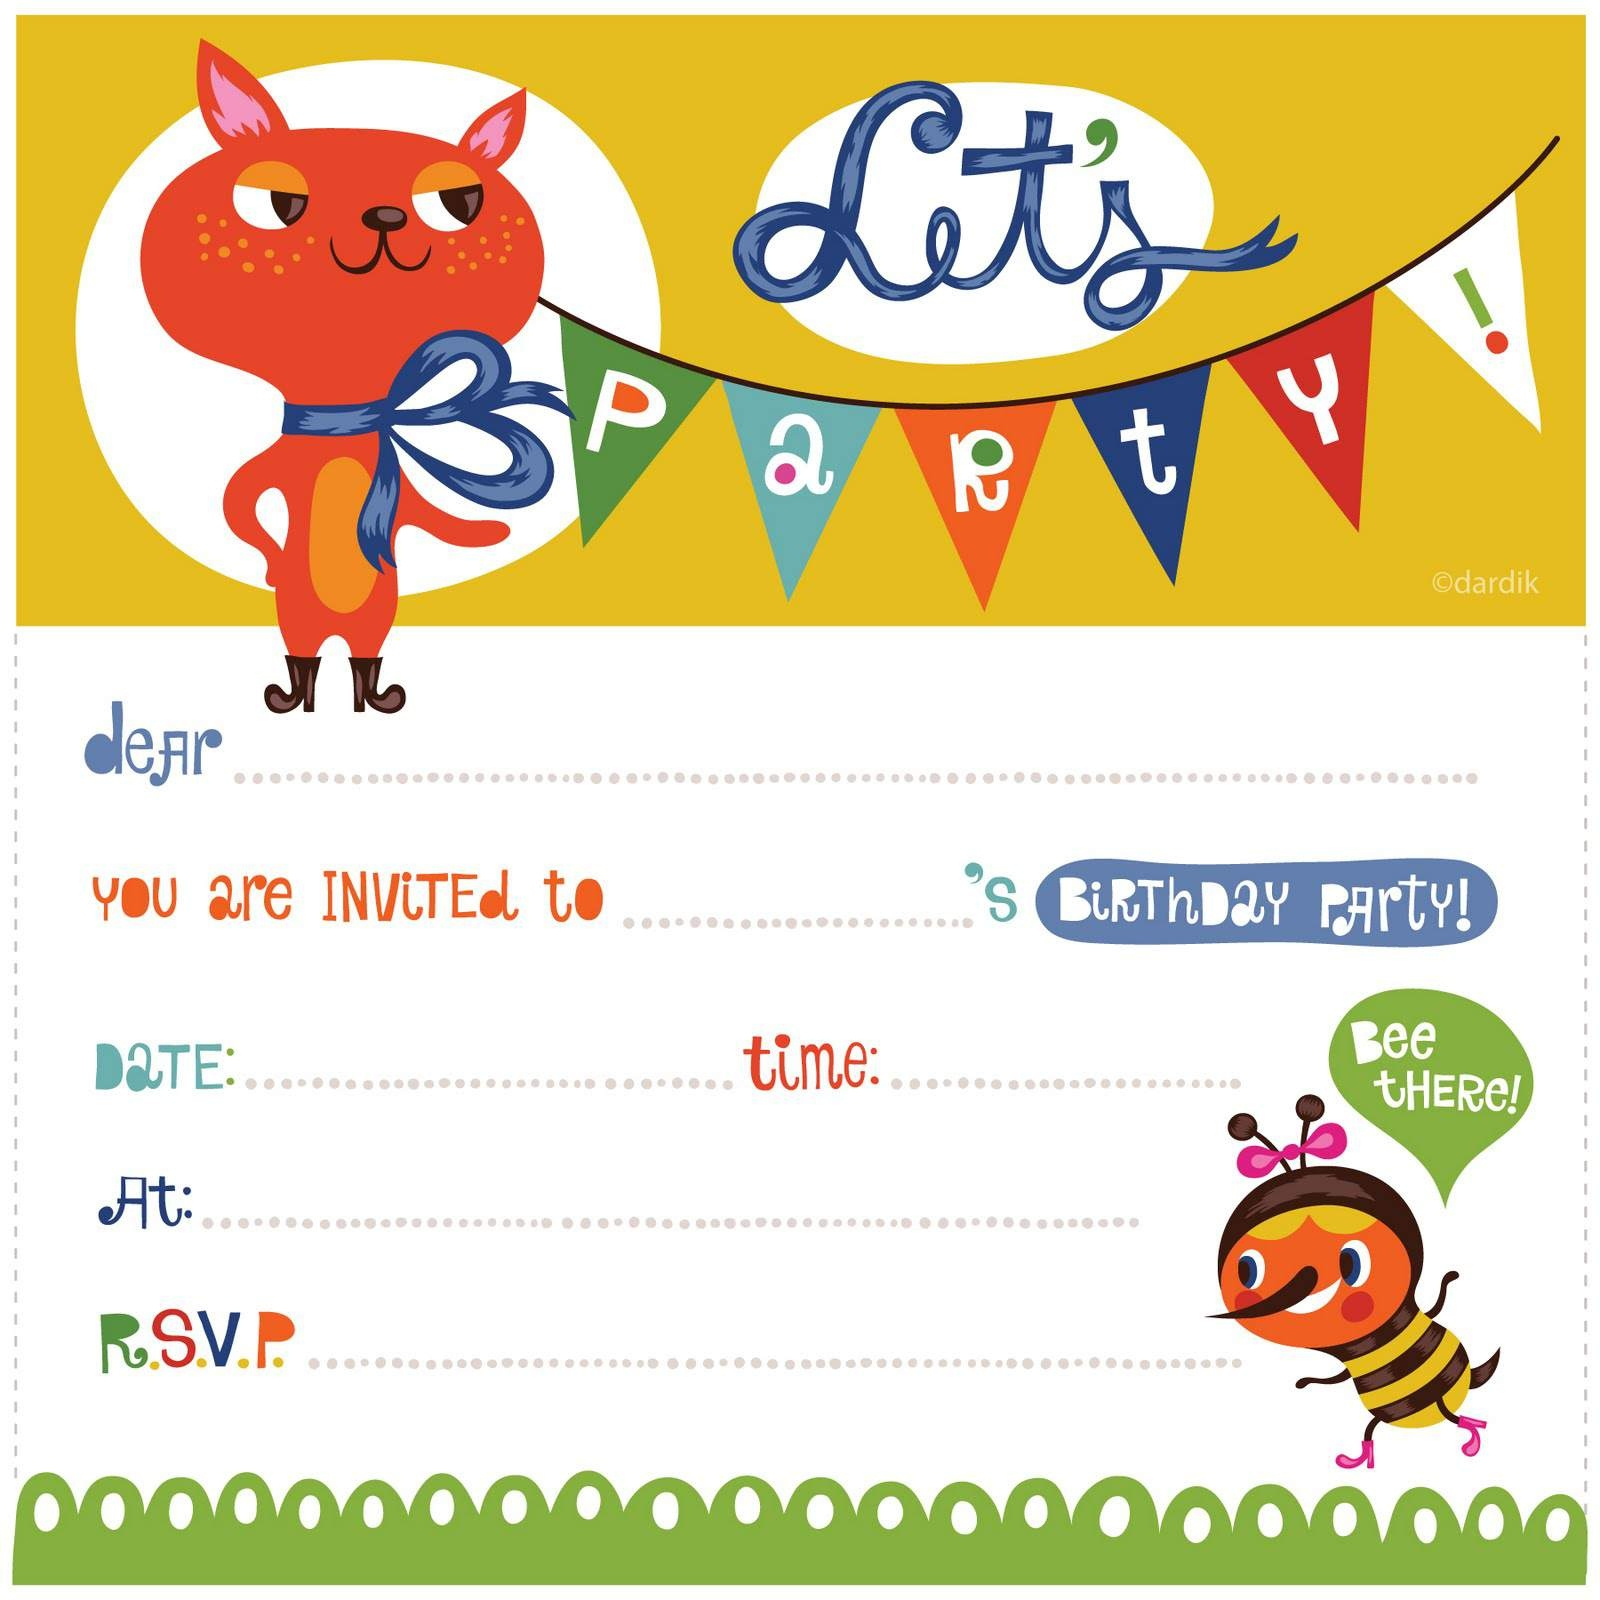 17 Free, Printable Birthday Invitations - Free Printable Kids Birthday Cards Boys